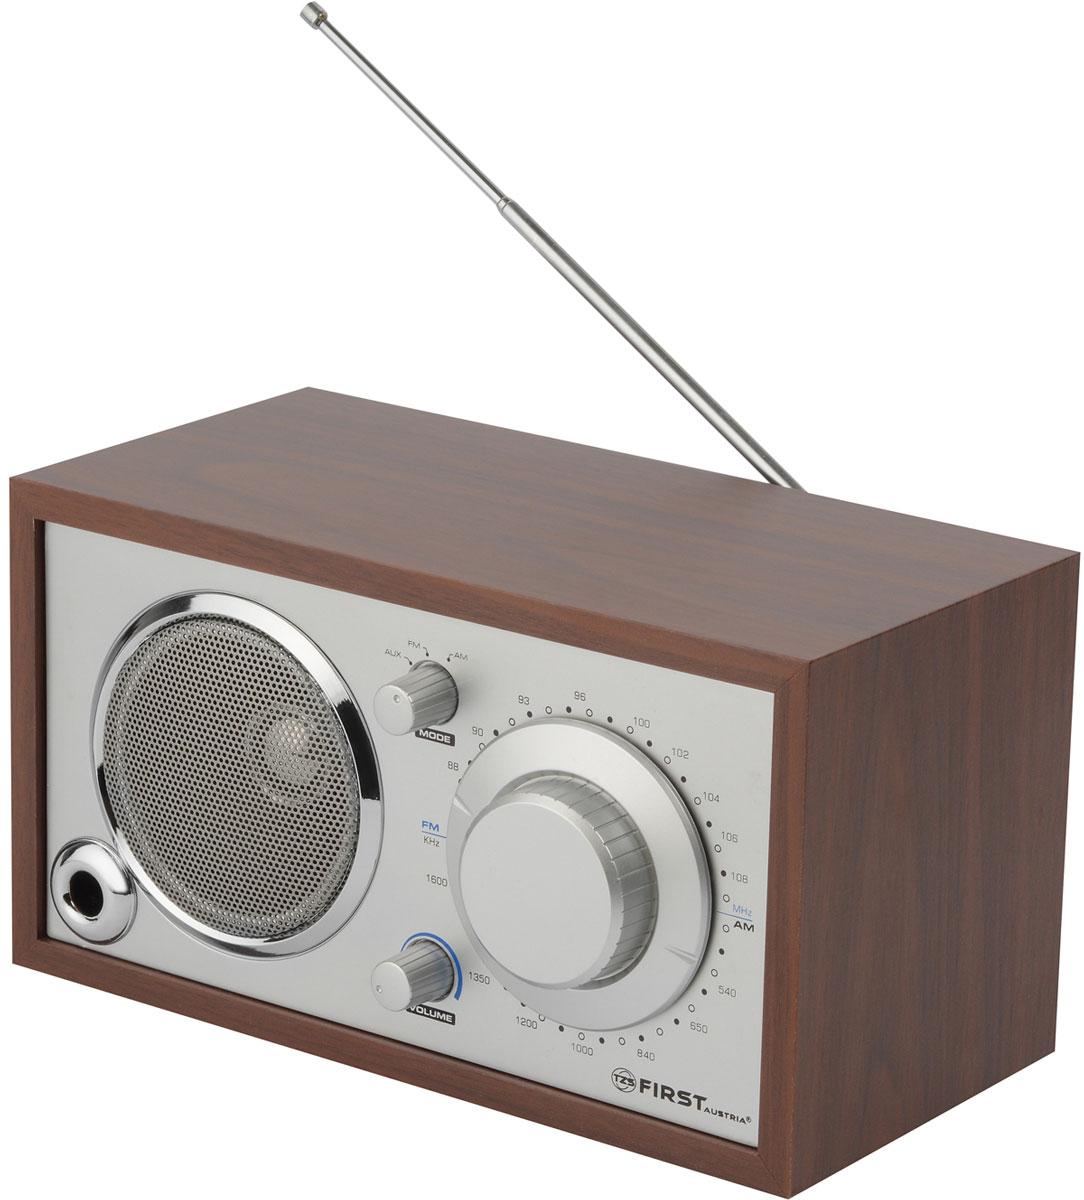 First FA-1907, Silver Wood радиоприемник FA-1907 Silver/wood